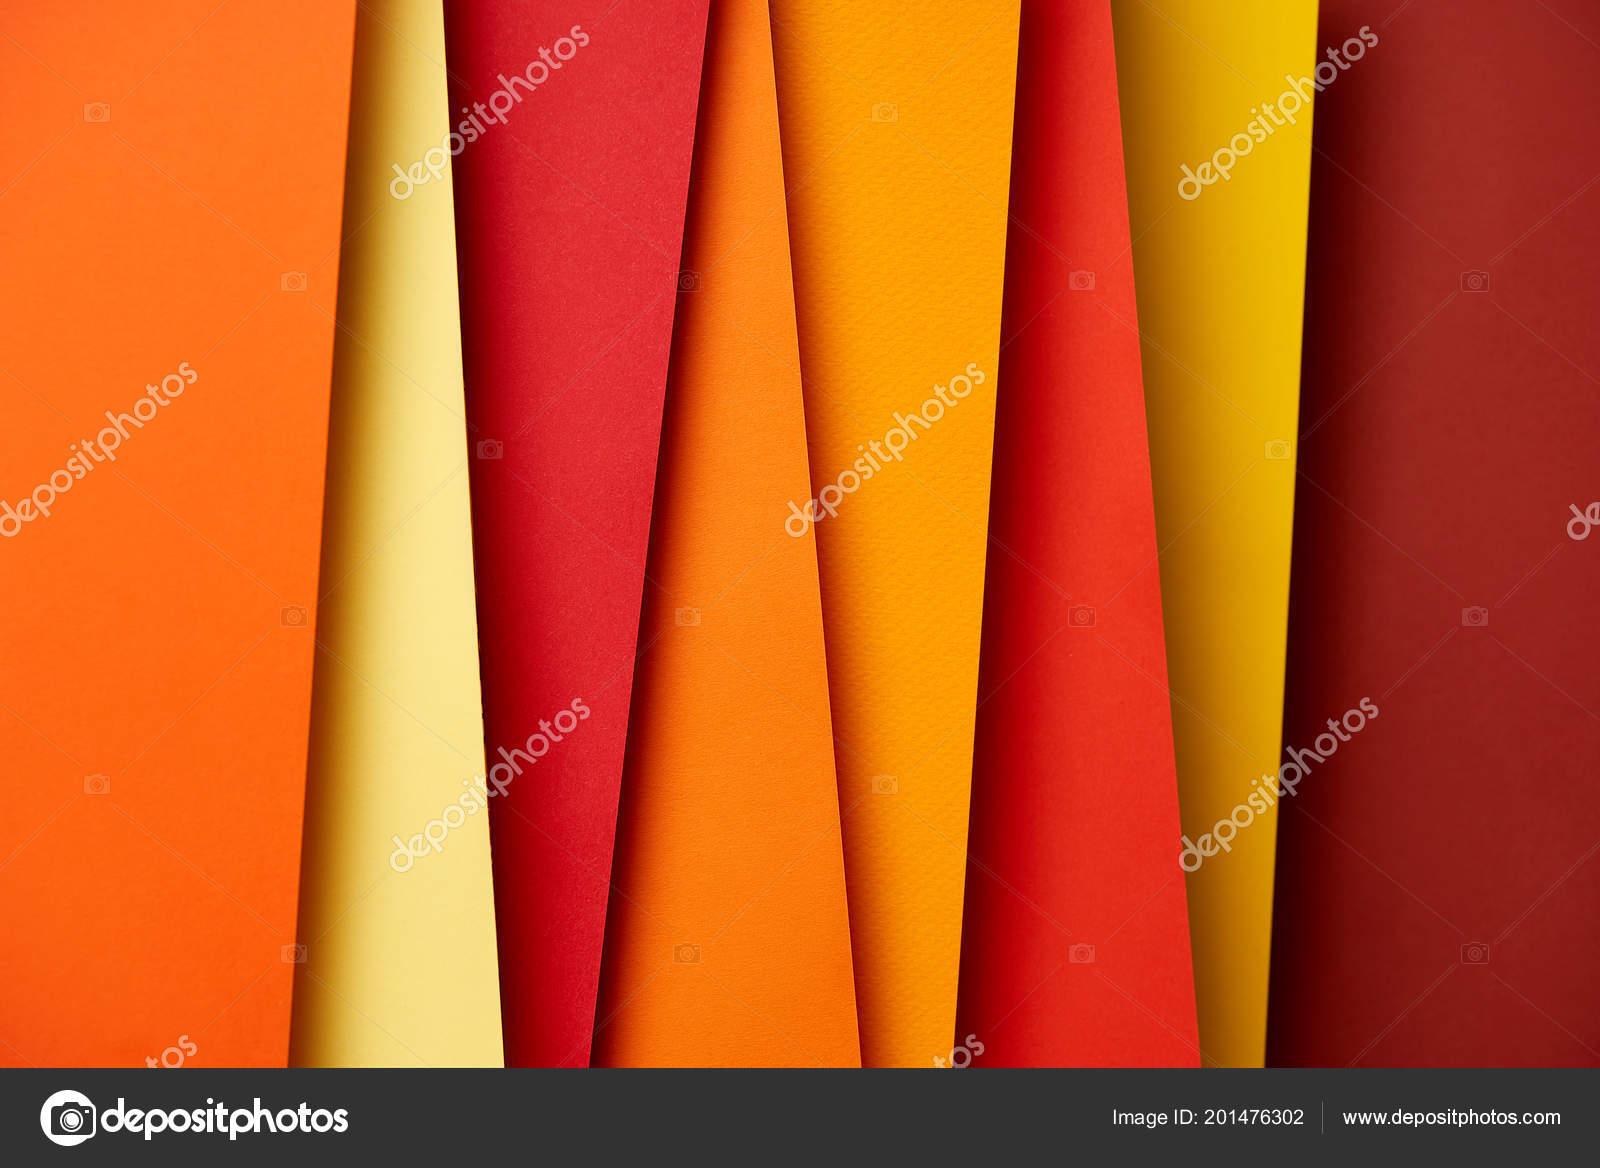 Vellen papier warme kleuren achtergrond u2014 stockfoto © micenin #201476302